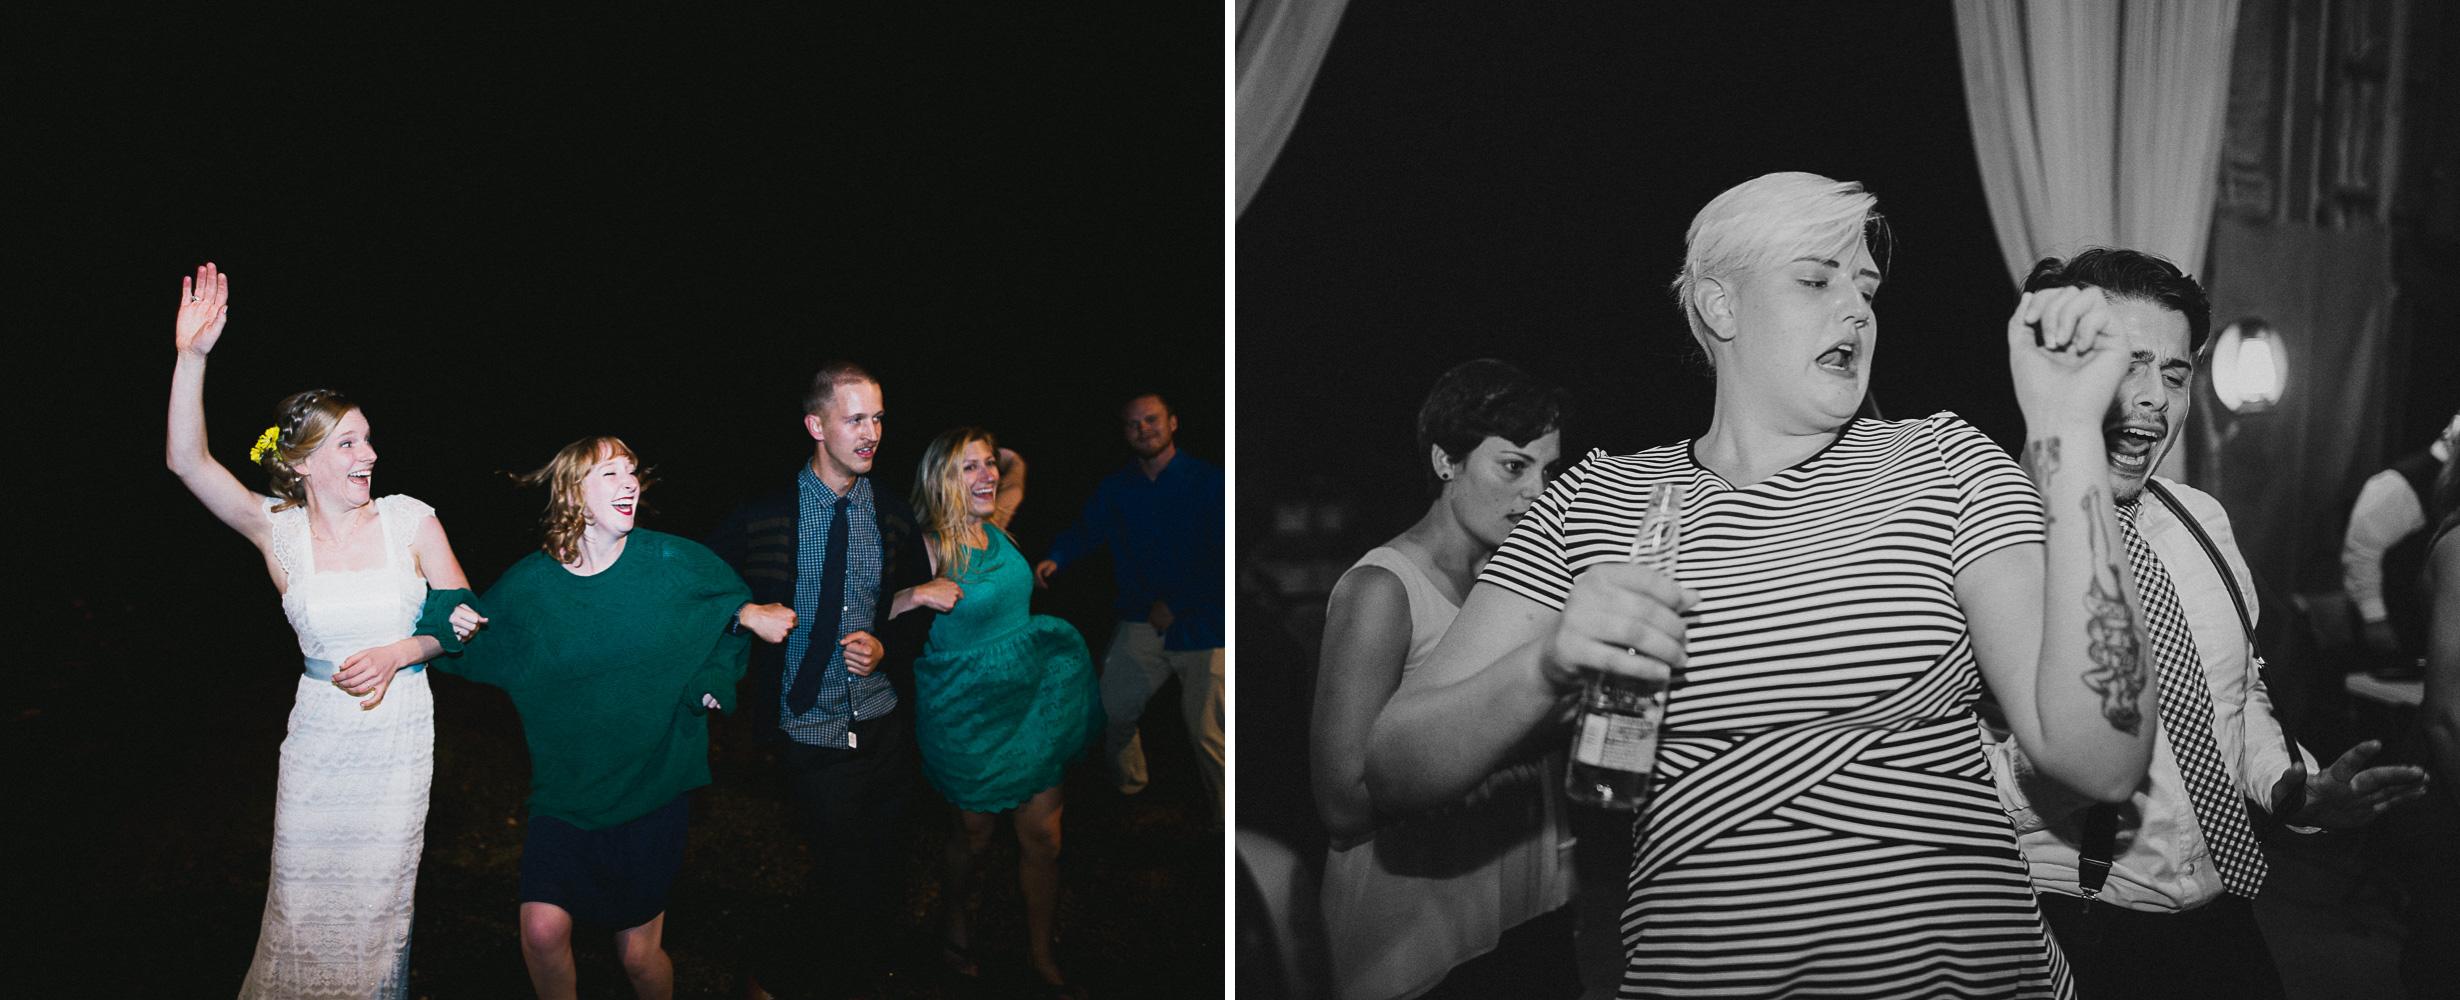 Salt-Lake-City-Wedding-Photographer-Utah-021.jpg